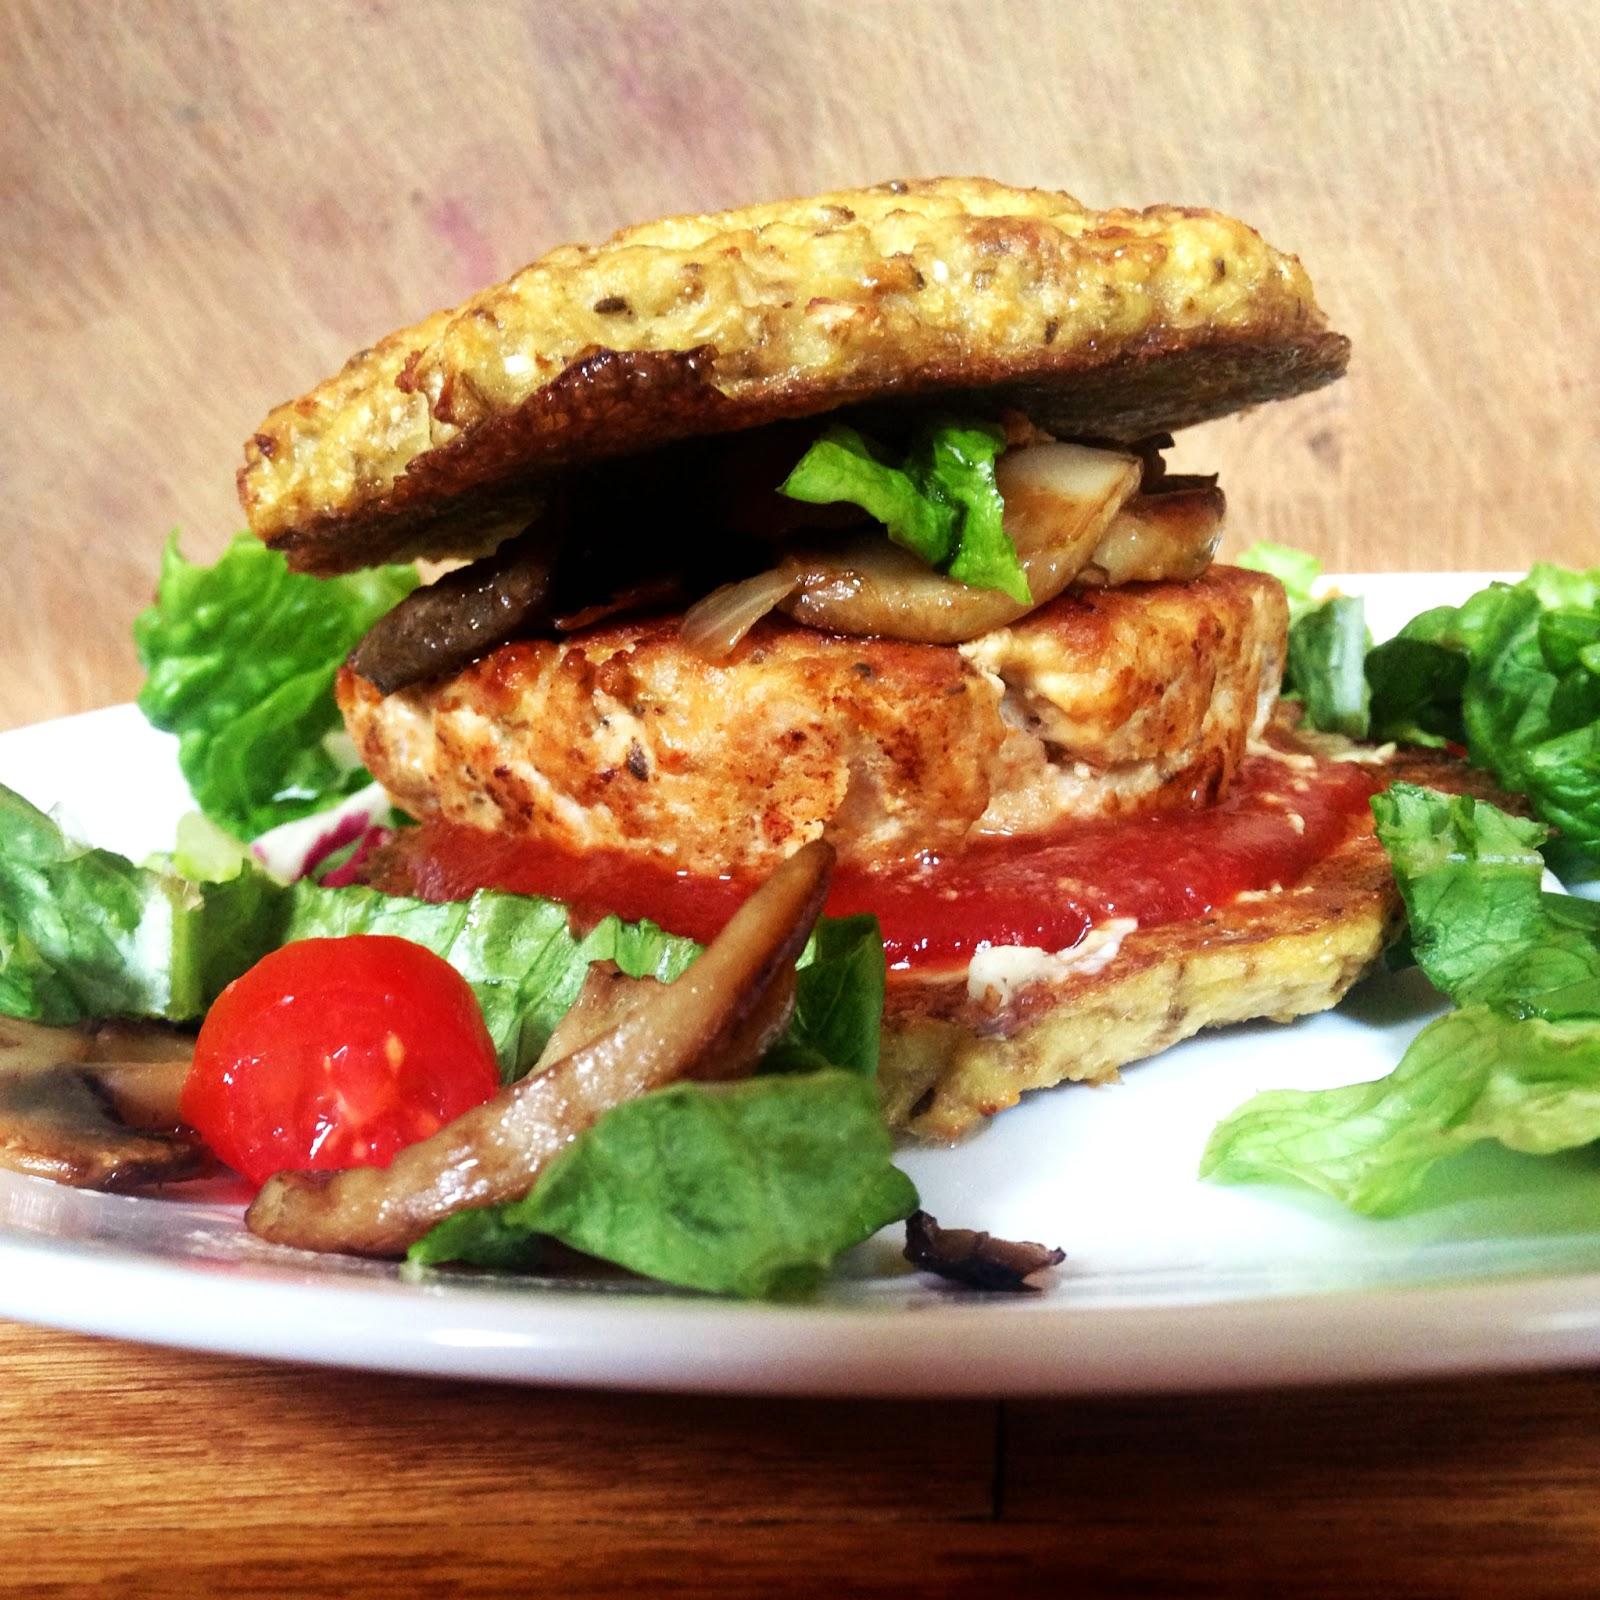 Live Right Be Healthy: Homemade Turkey Burgers on a Cauliflower Bun